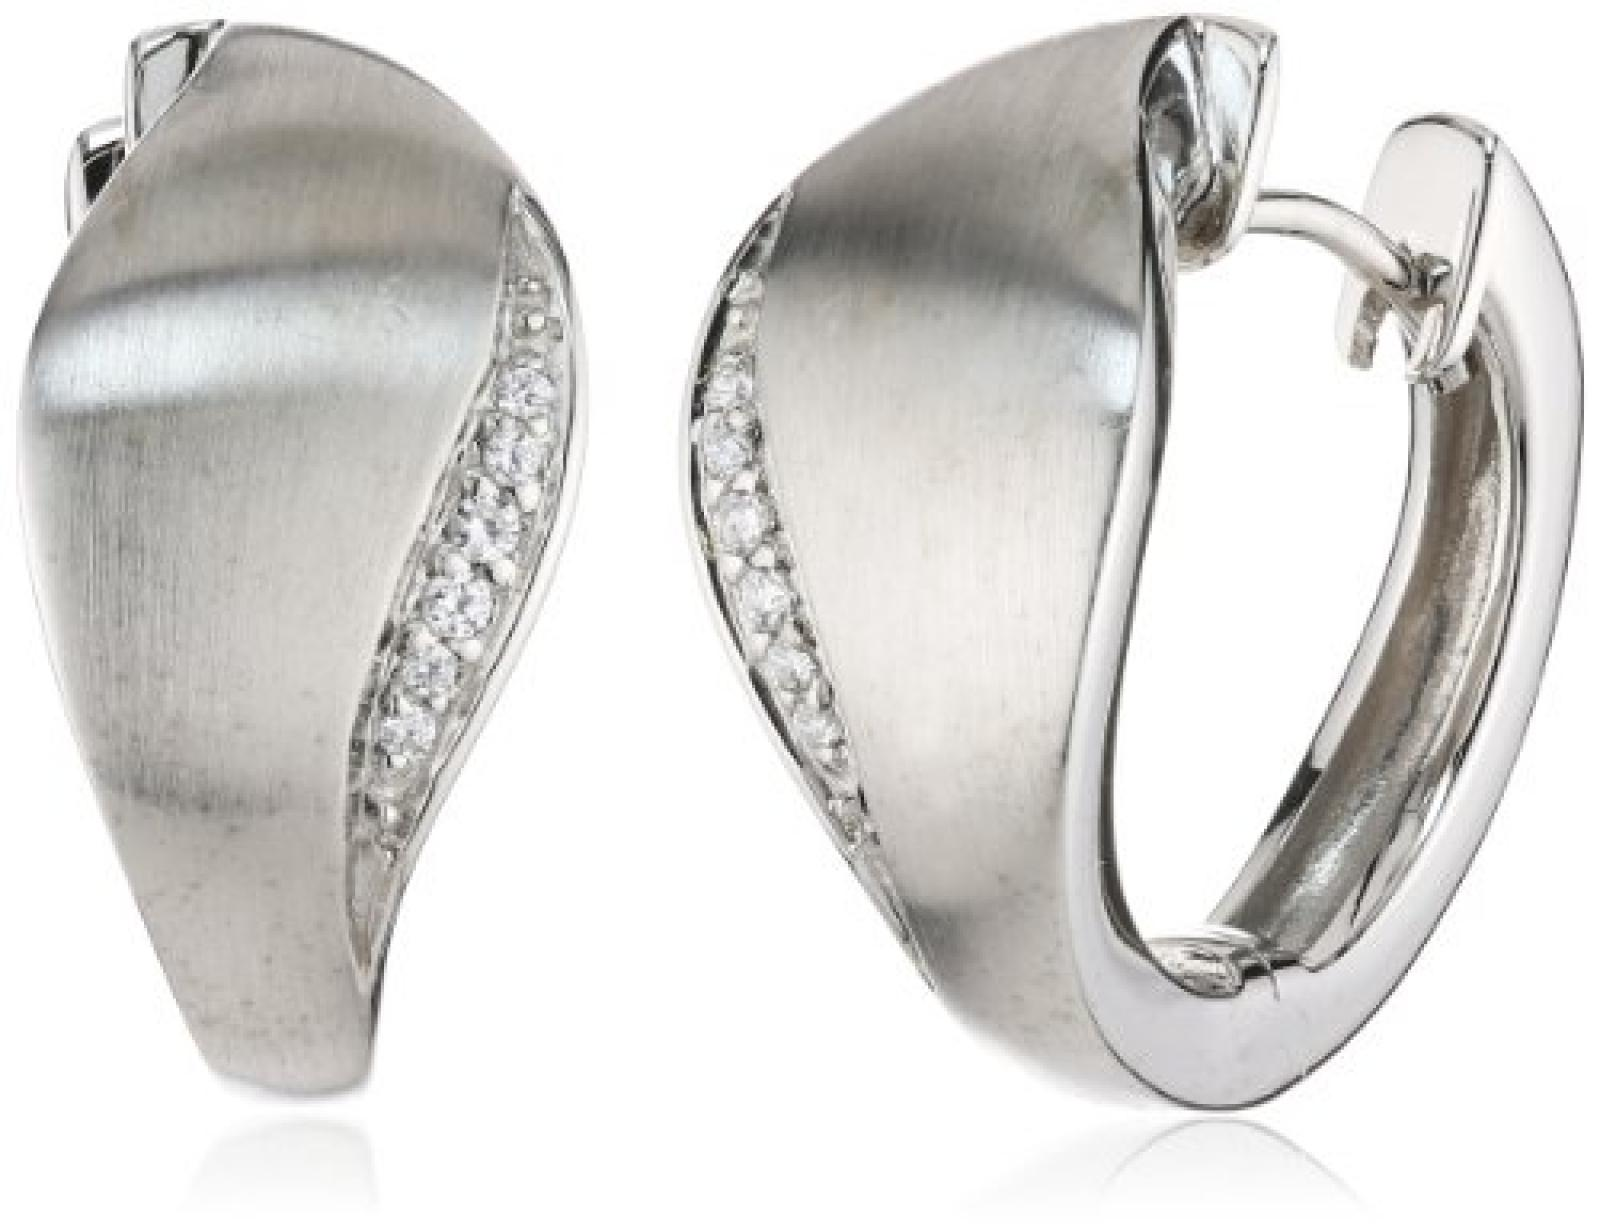 Viventy Damen-Creolen 925 Sterling Silber mit 12 Zirkonia in weiss 763994